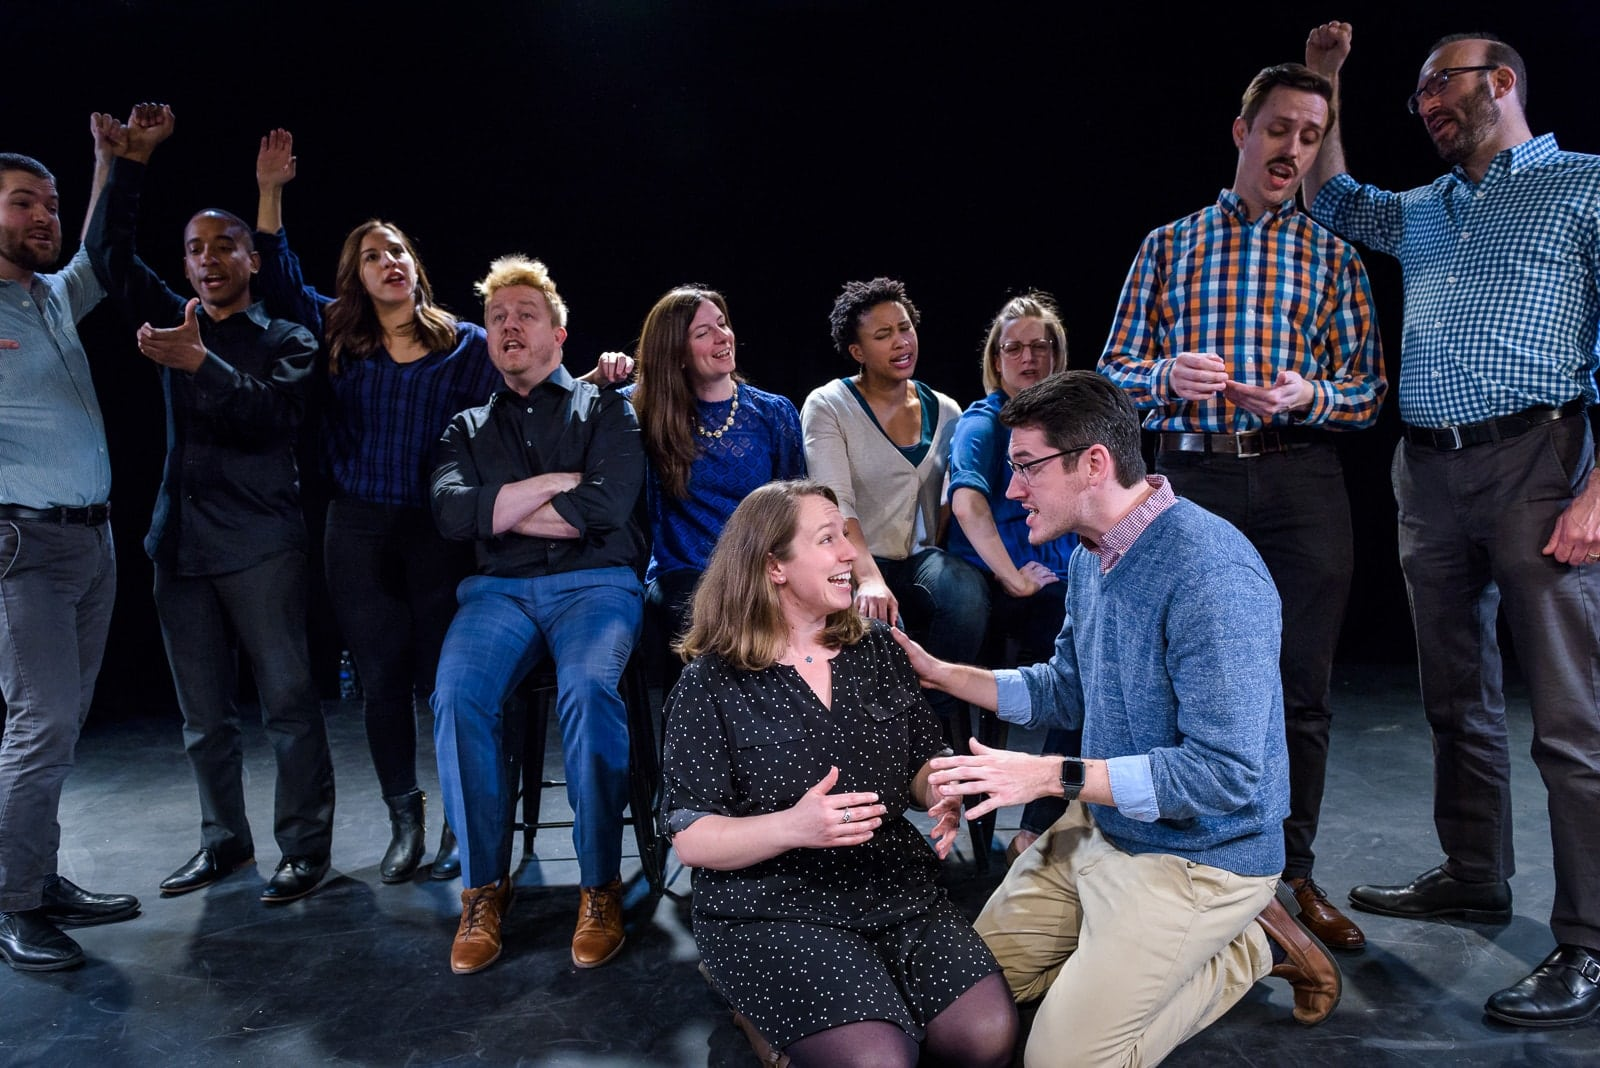 iMusical's ensemble team. Photo by Jeff Salmore.